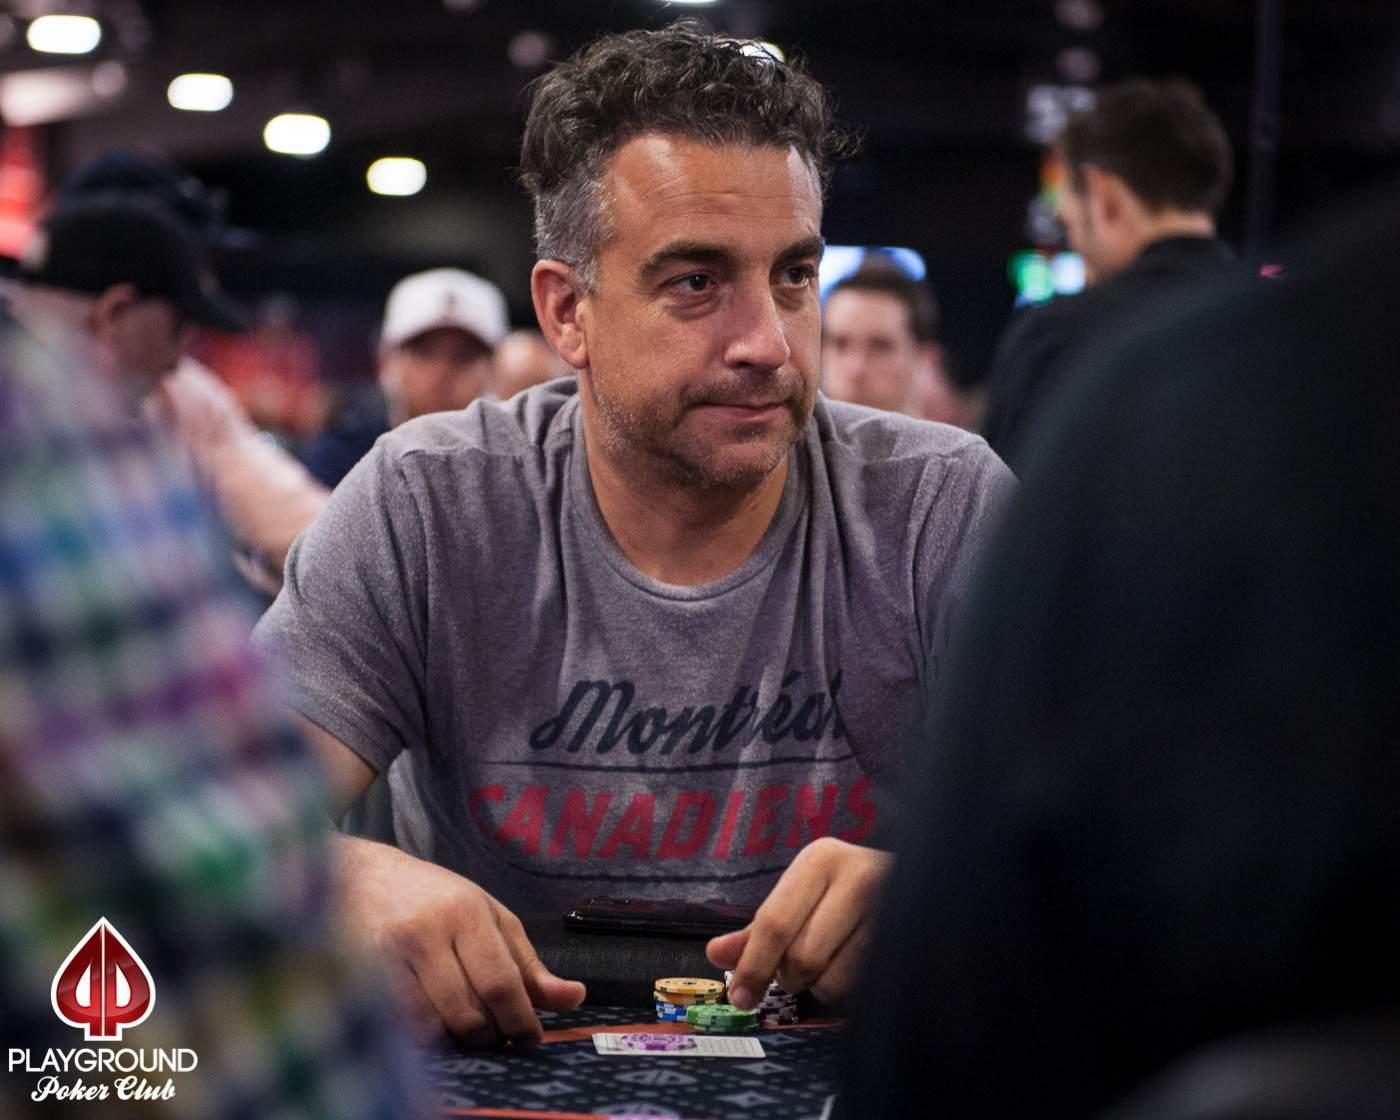 Closest hotels to playground poker club poker dwan 2016